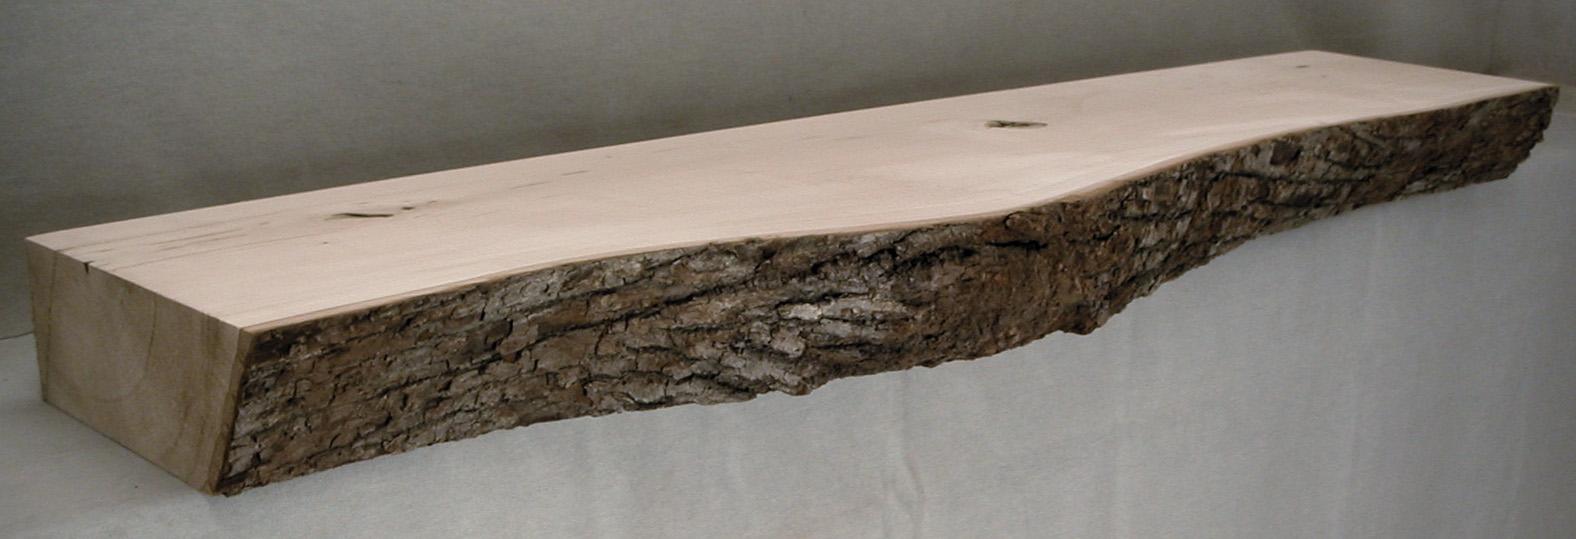 Log Style Fireplace Mantels Hardwood Hartford WI